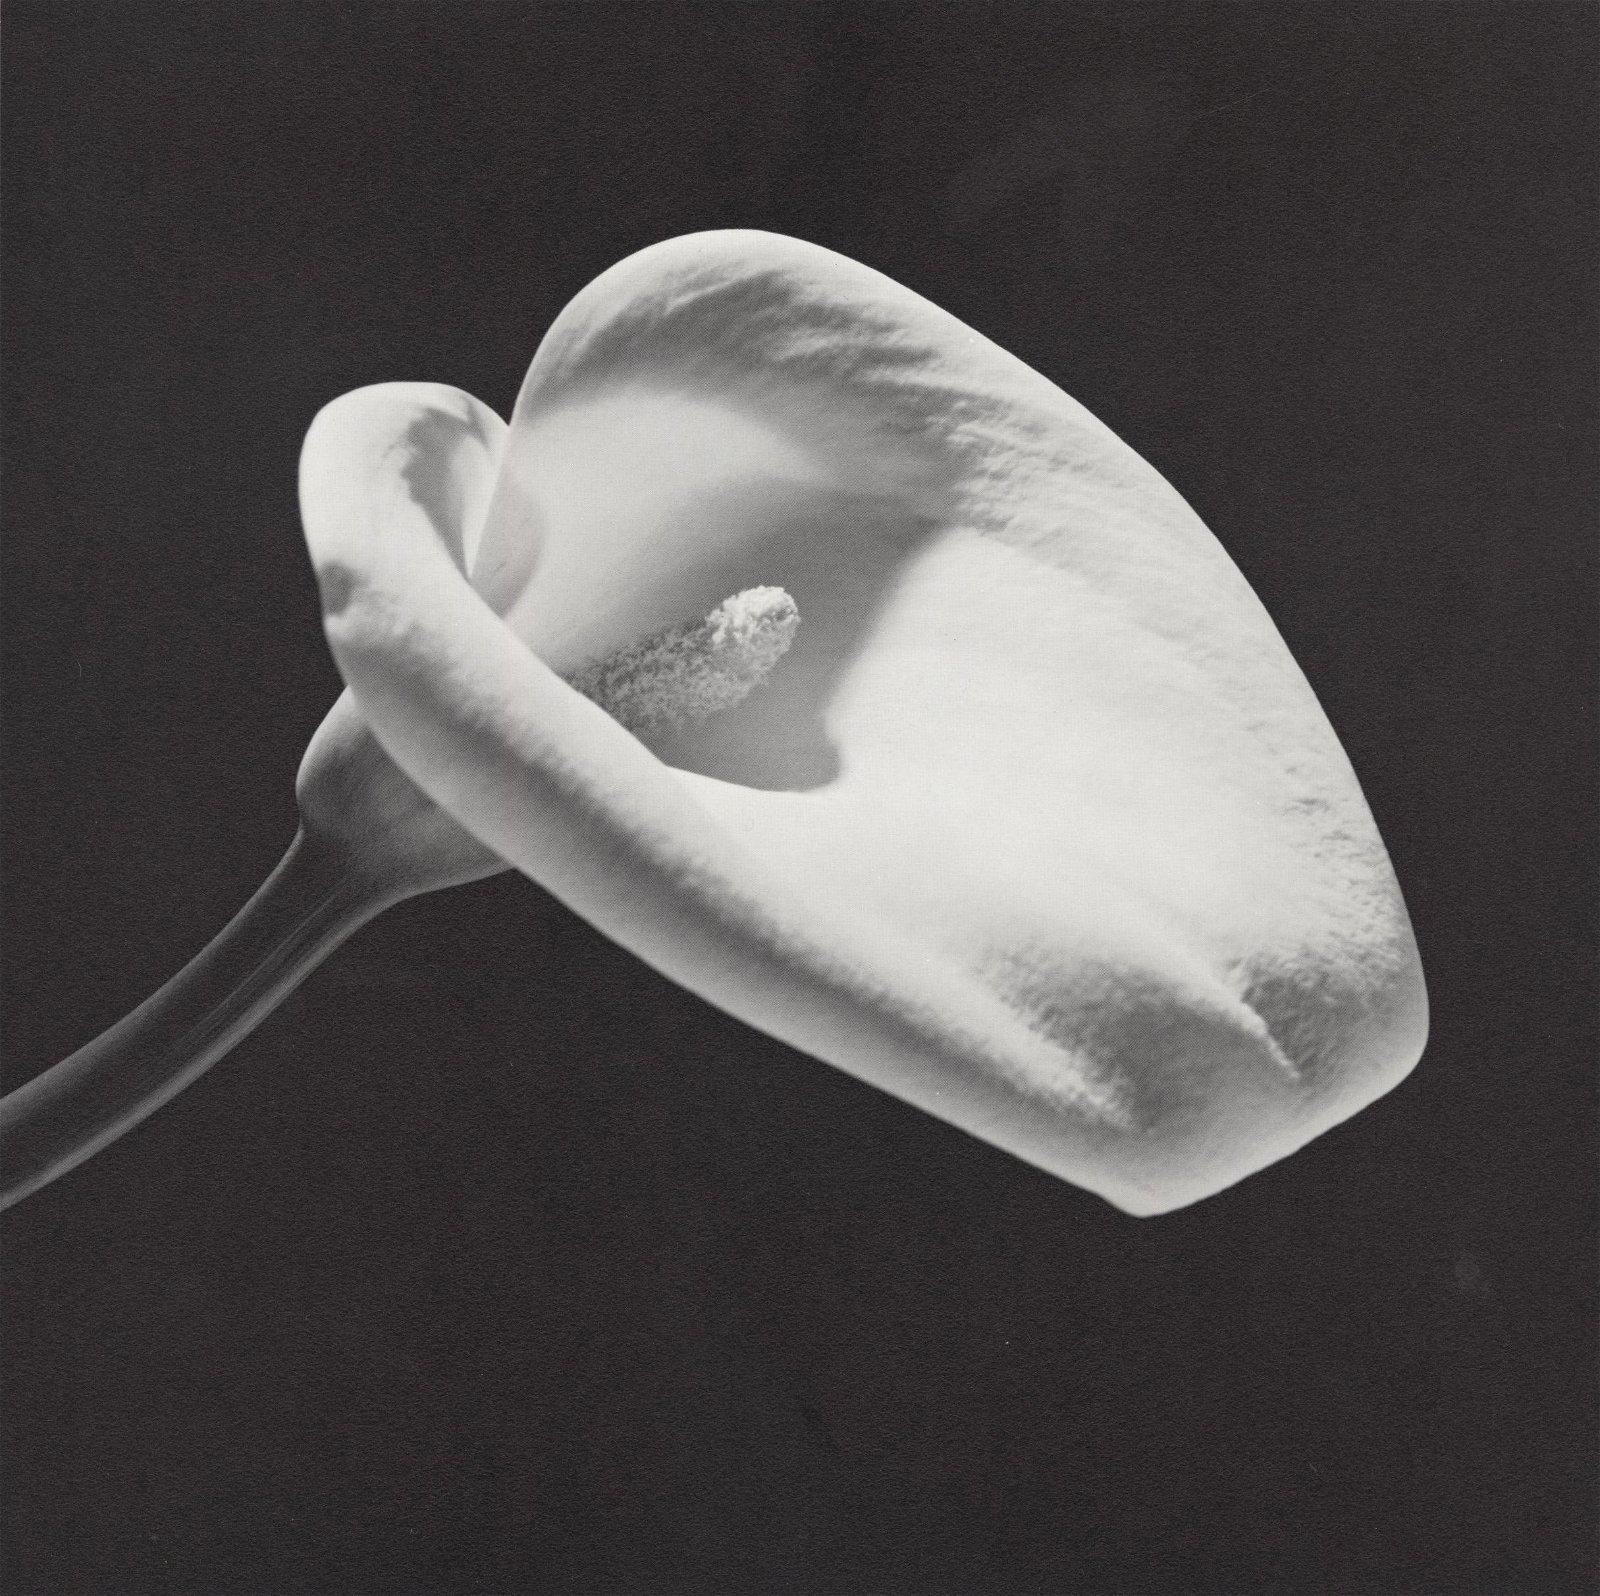 ROBERT MAPPLETHORPE - Calla Lily, 1984 (#2) - Original